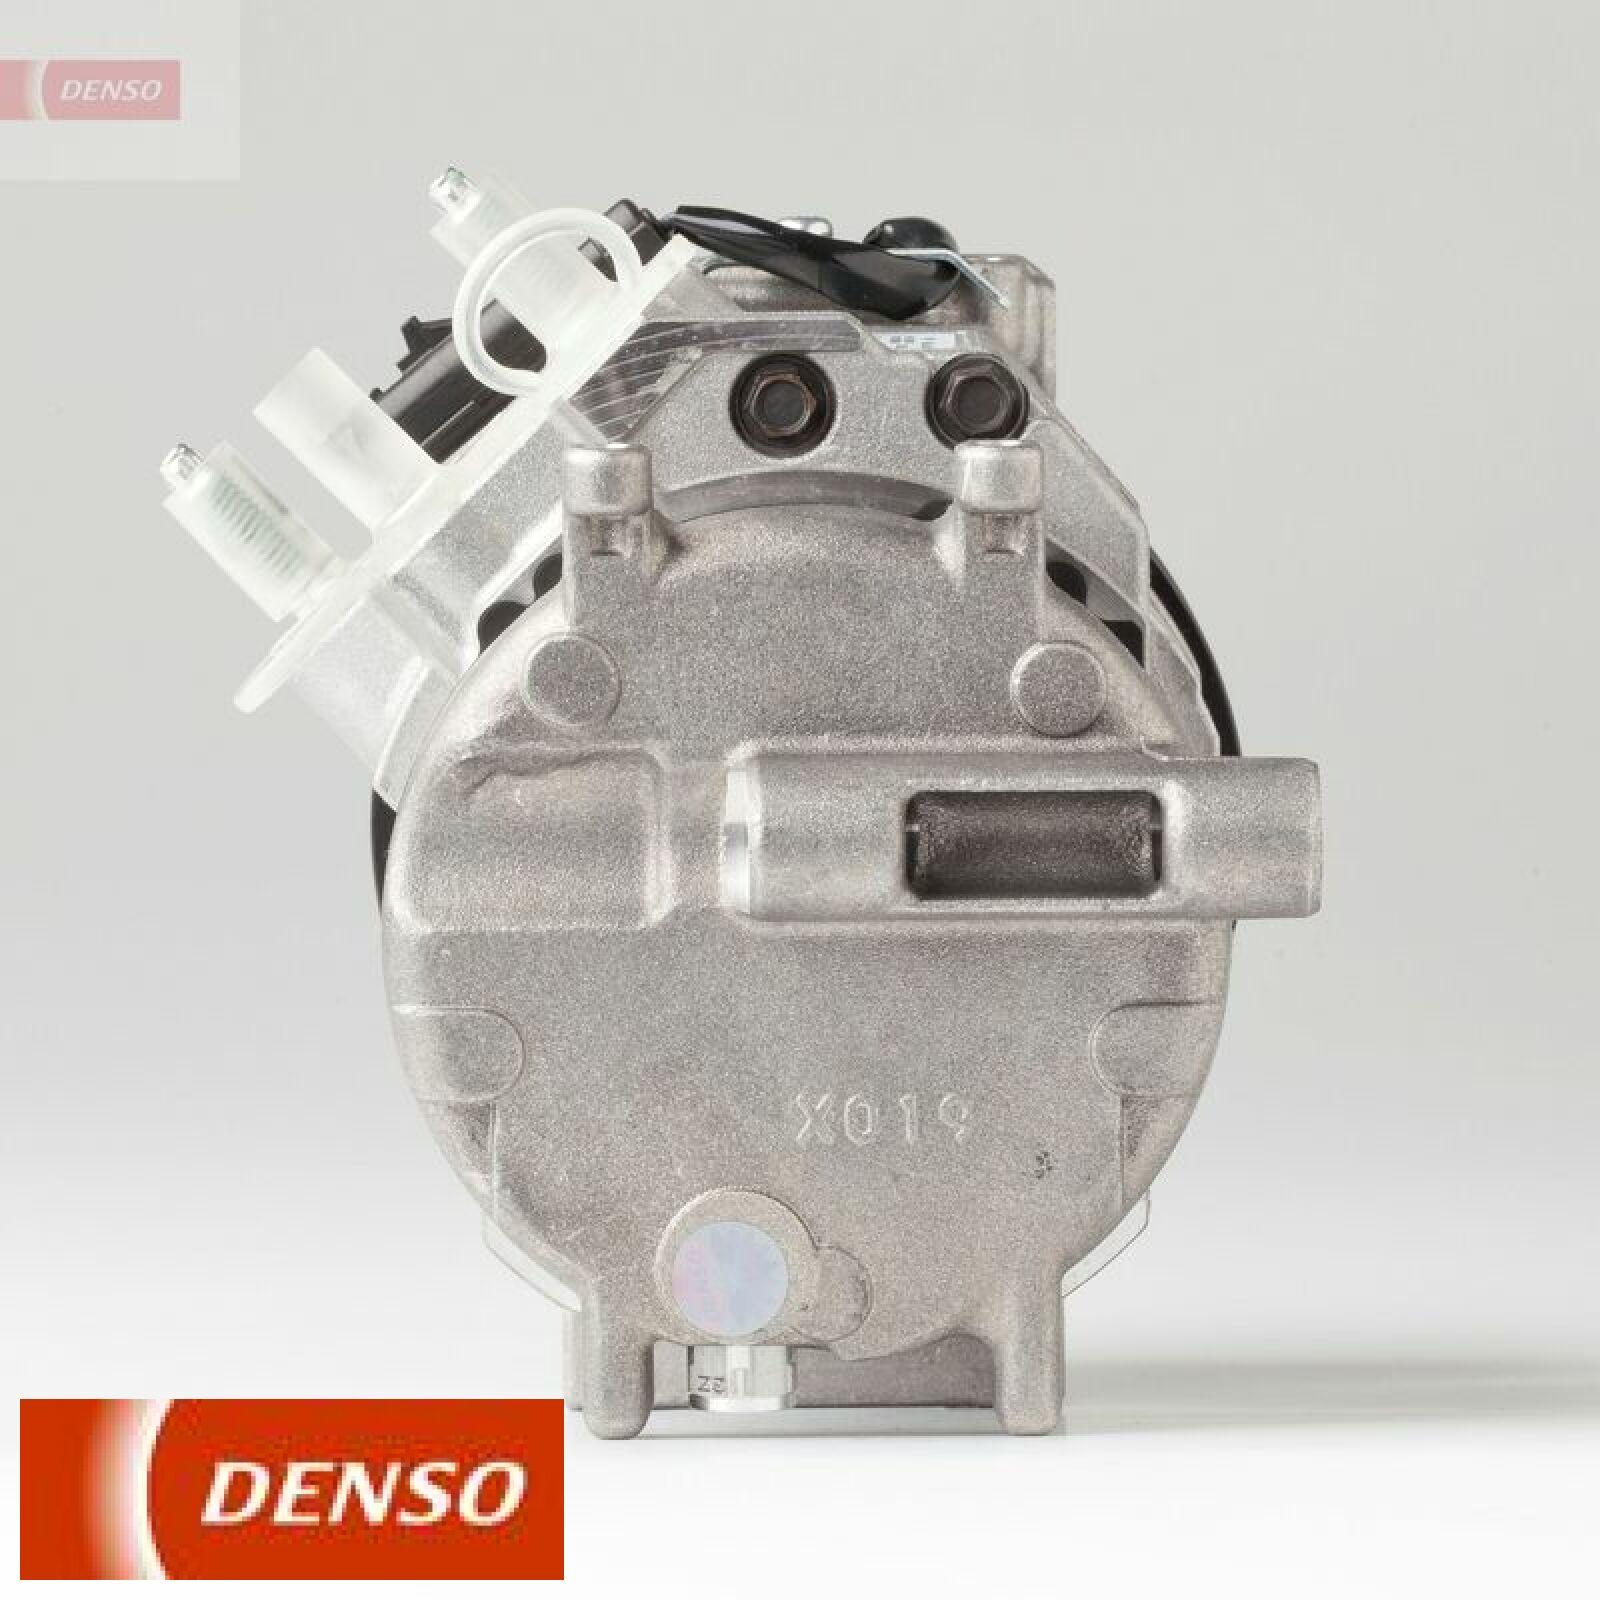 Denso Klimakompressor Kompressor Klima Klimaanlage Kompresor Vw Polo Dcp20021